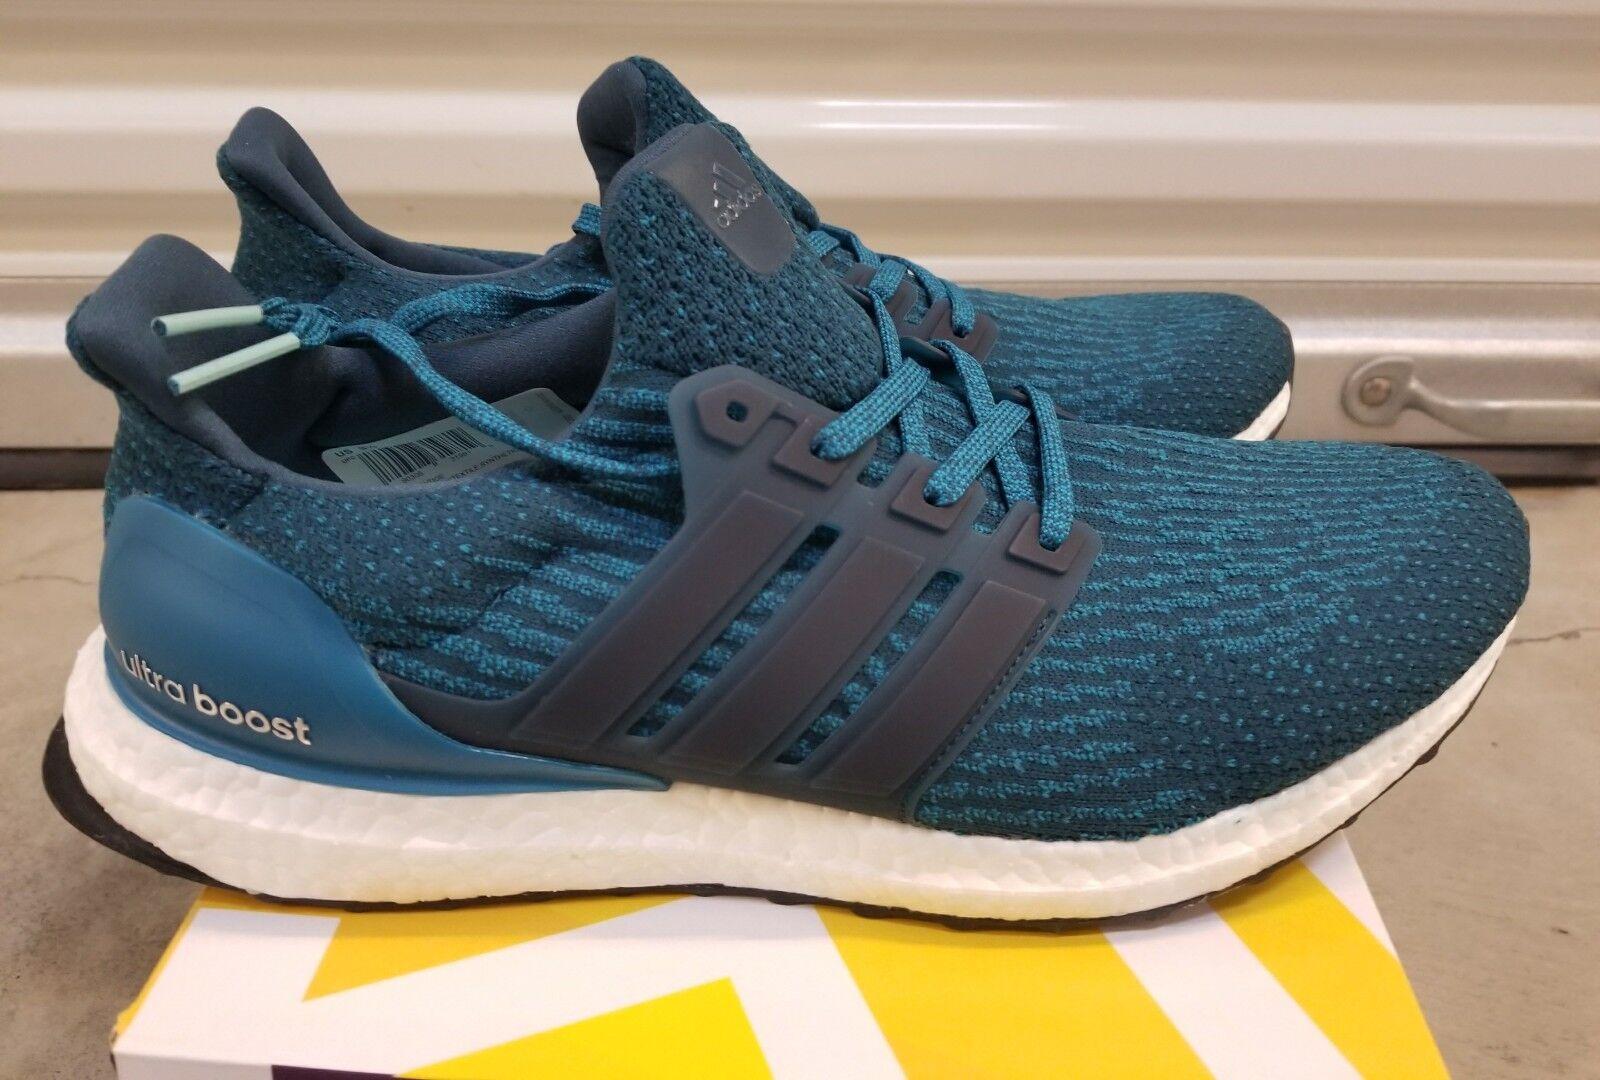 Adidas Ultra Boost 3.0 Petrol Night Mystery Blue Size US 9.5 Receipt S82021